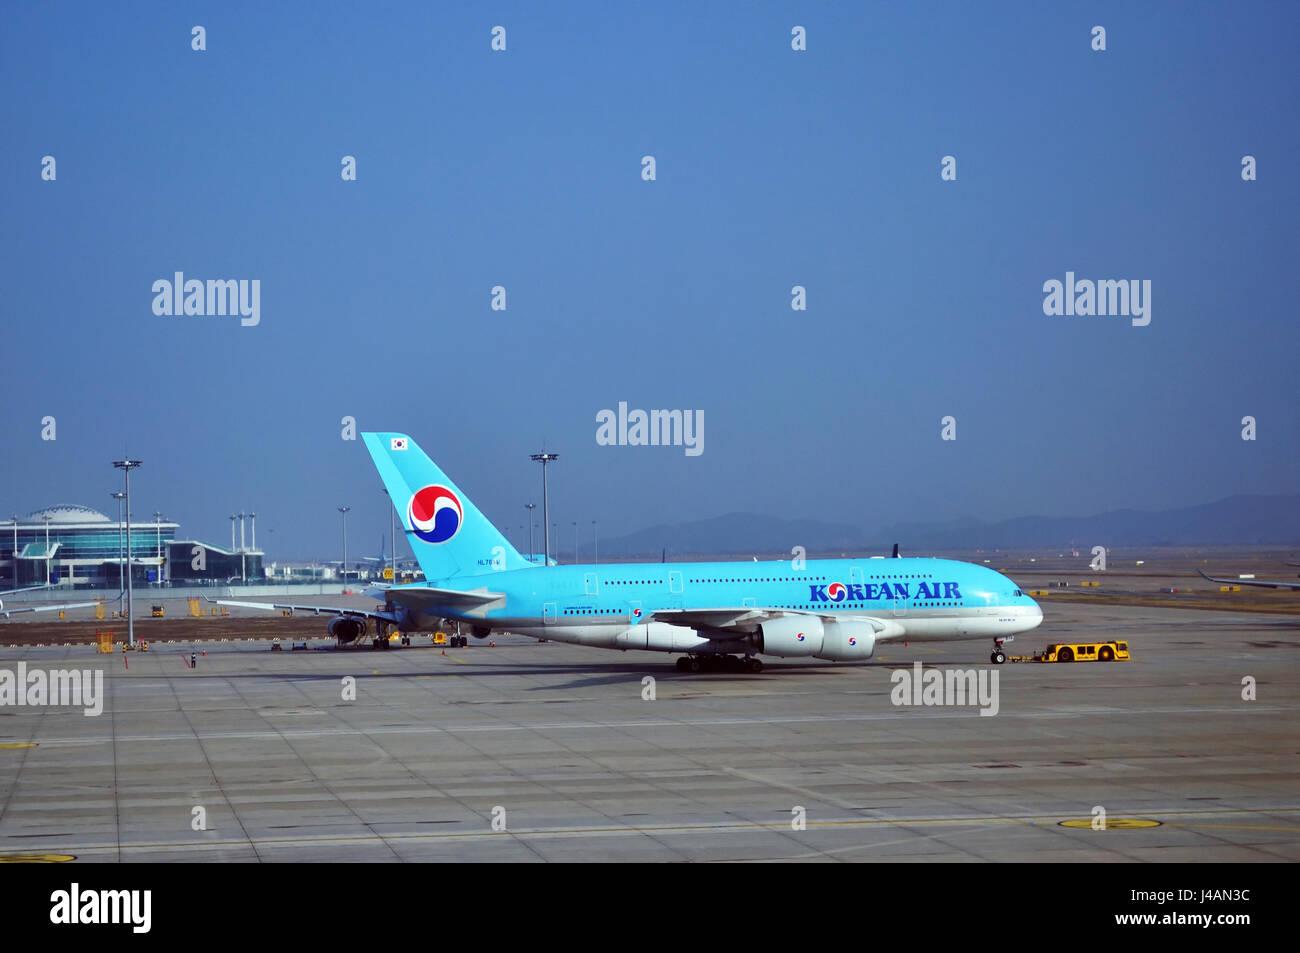 SEOUL, SOUTH KOREA - APRIL 9, 2017 - Korean Air Airbus A380-800 taxiing along the runway in Incheon International - Stock Image